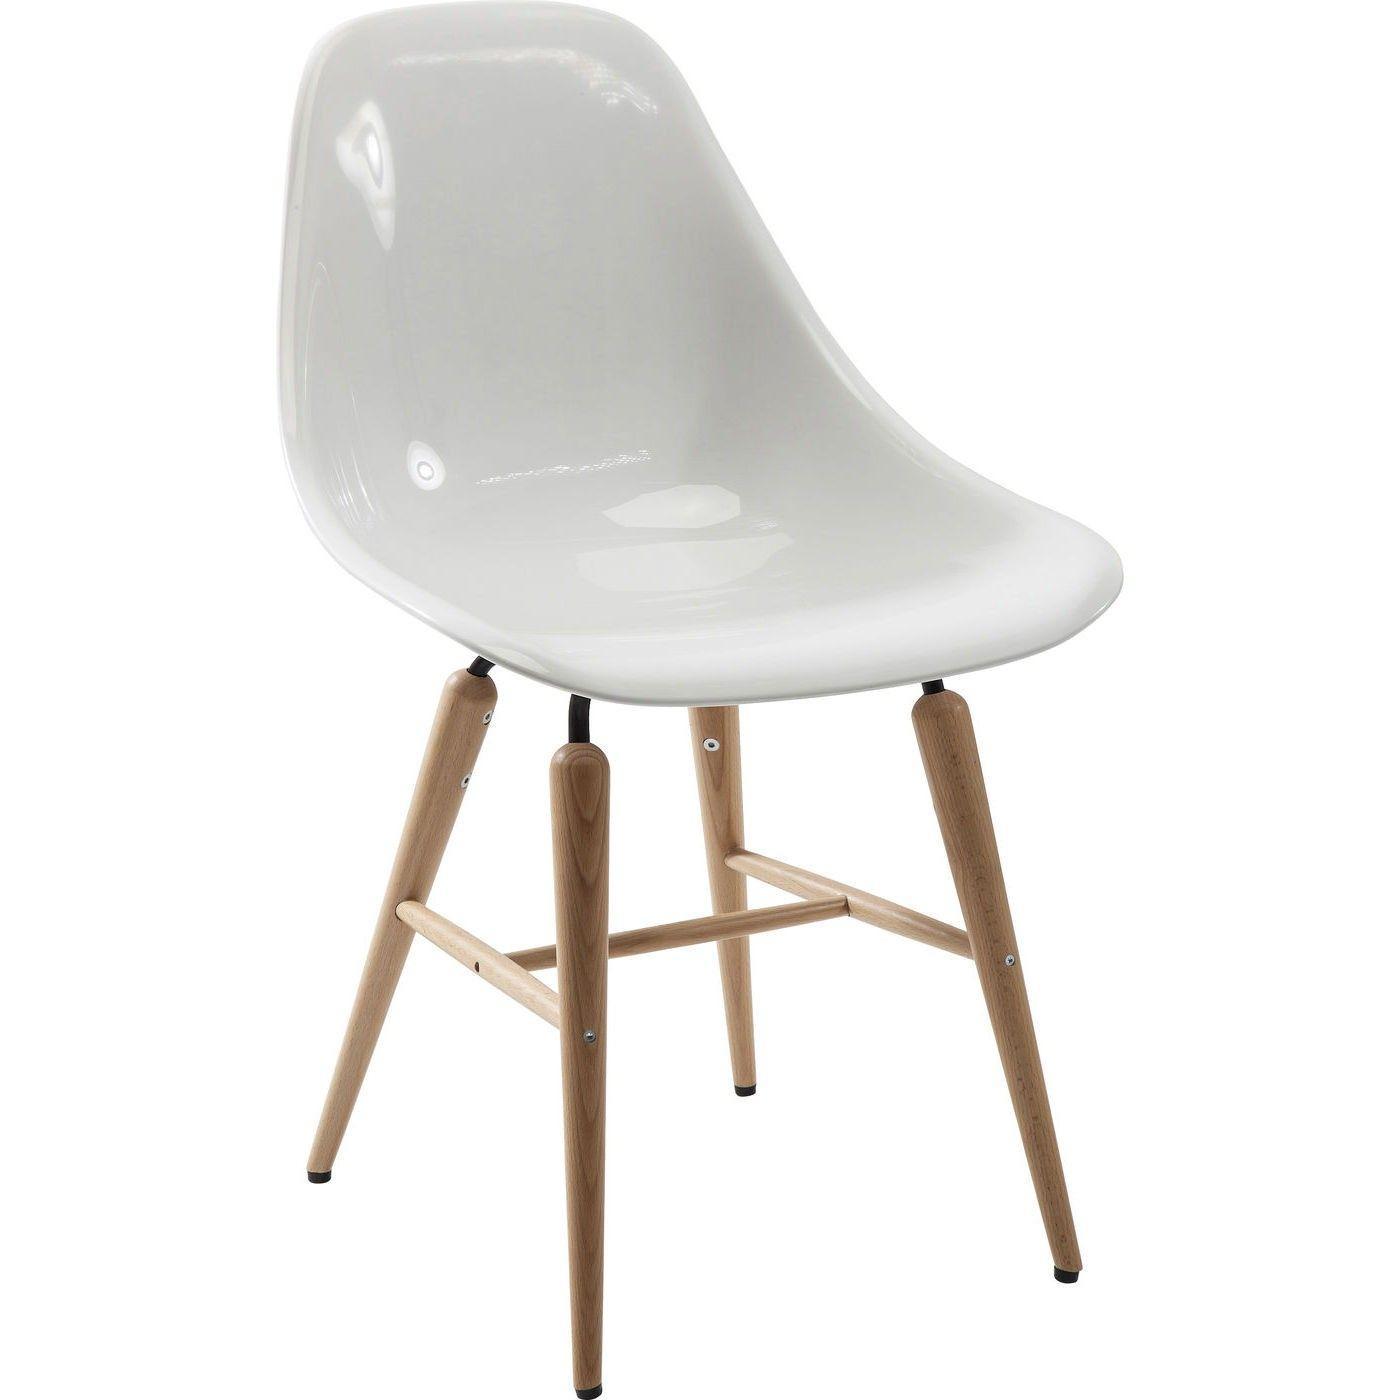 Wasa Möbel Stühle